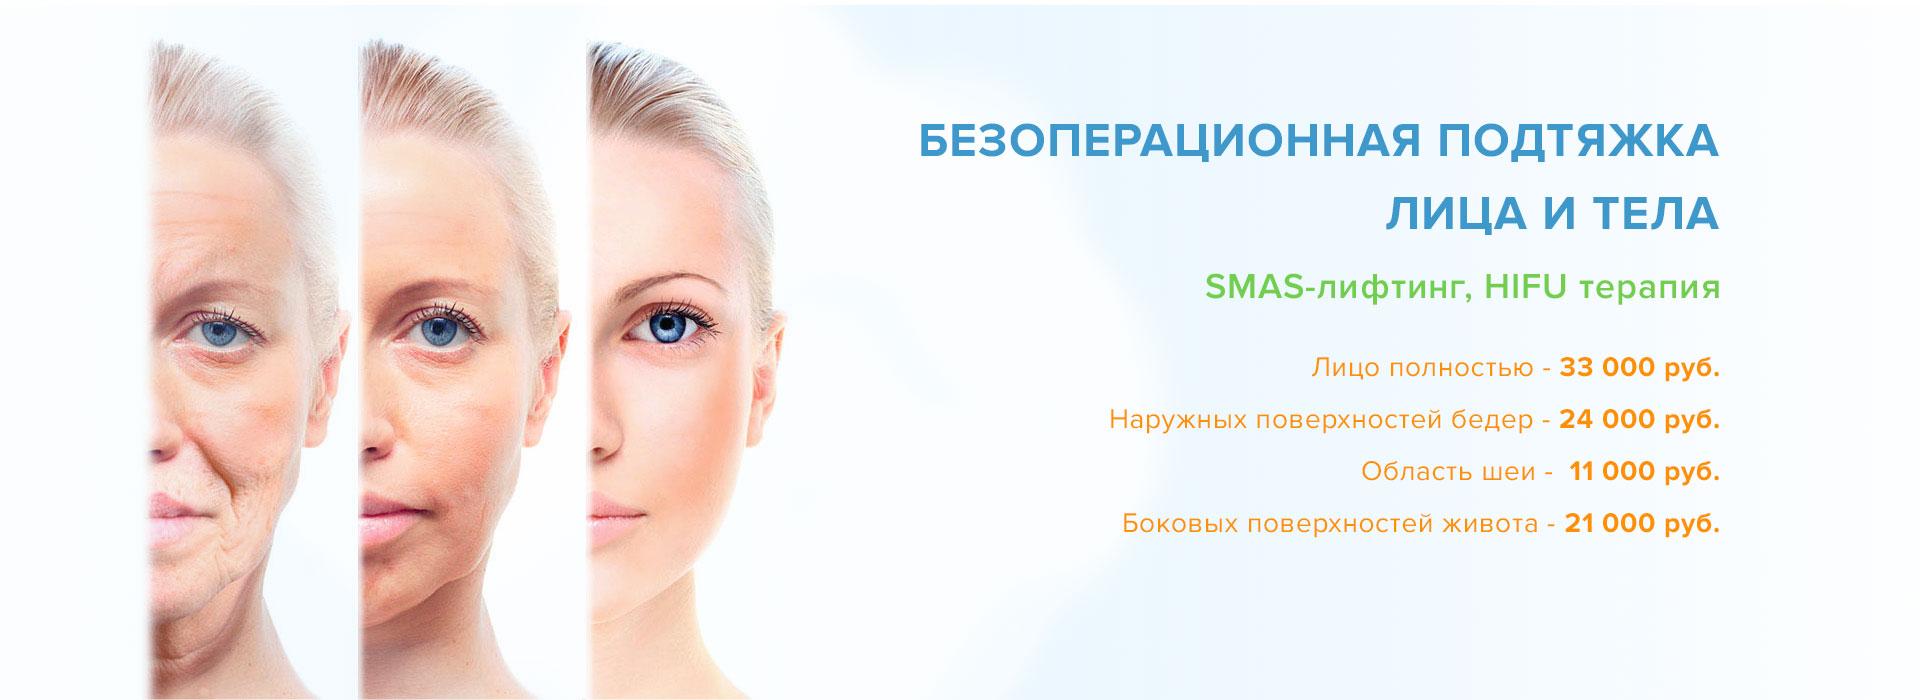 Сорокина врач офтальмолог